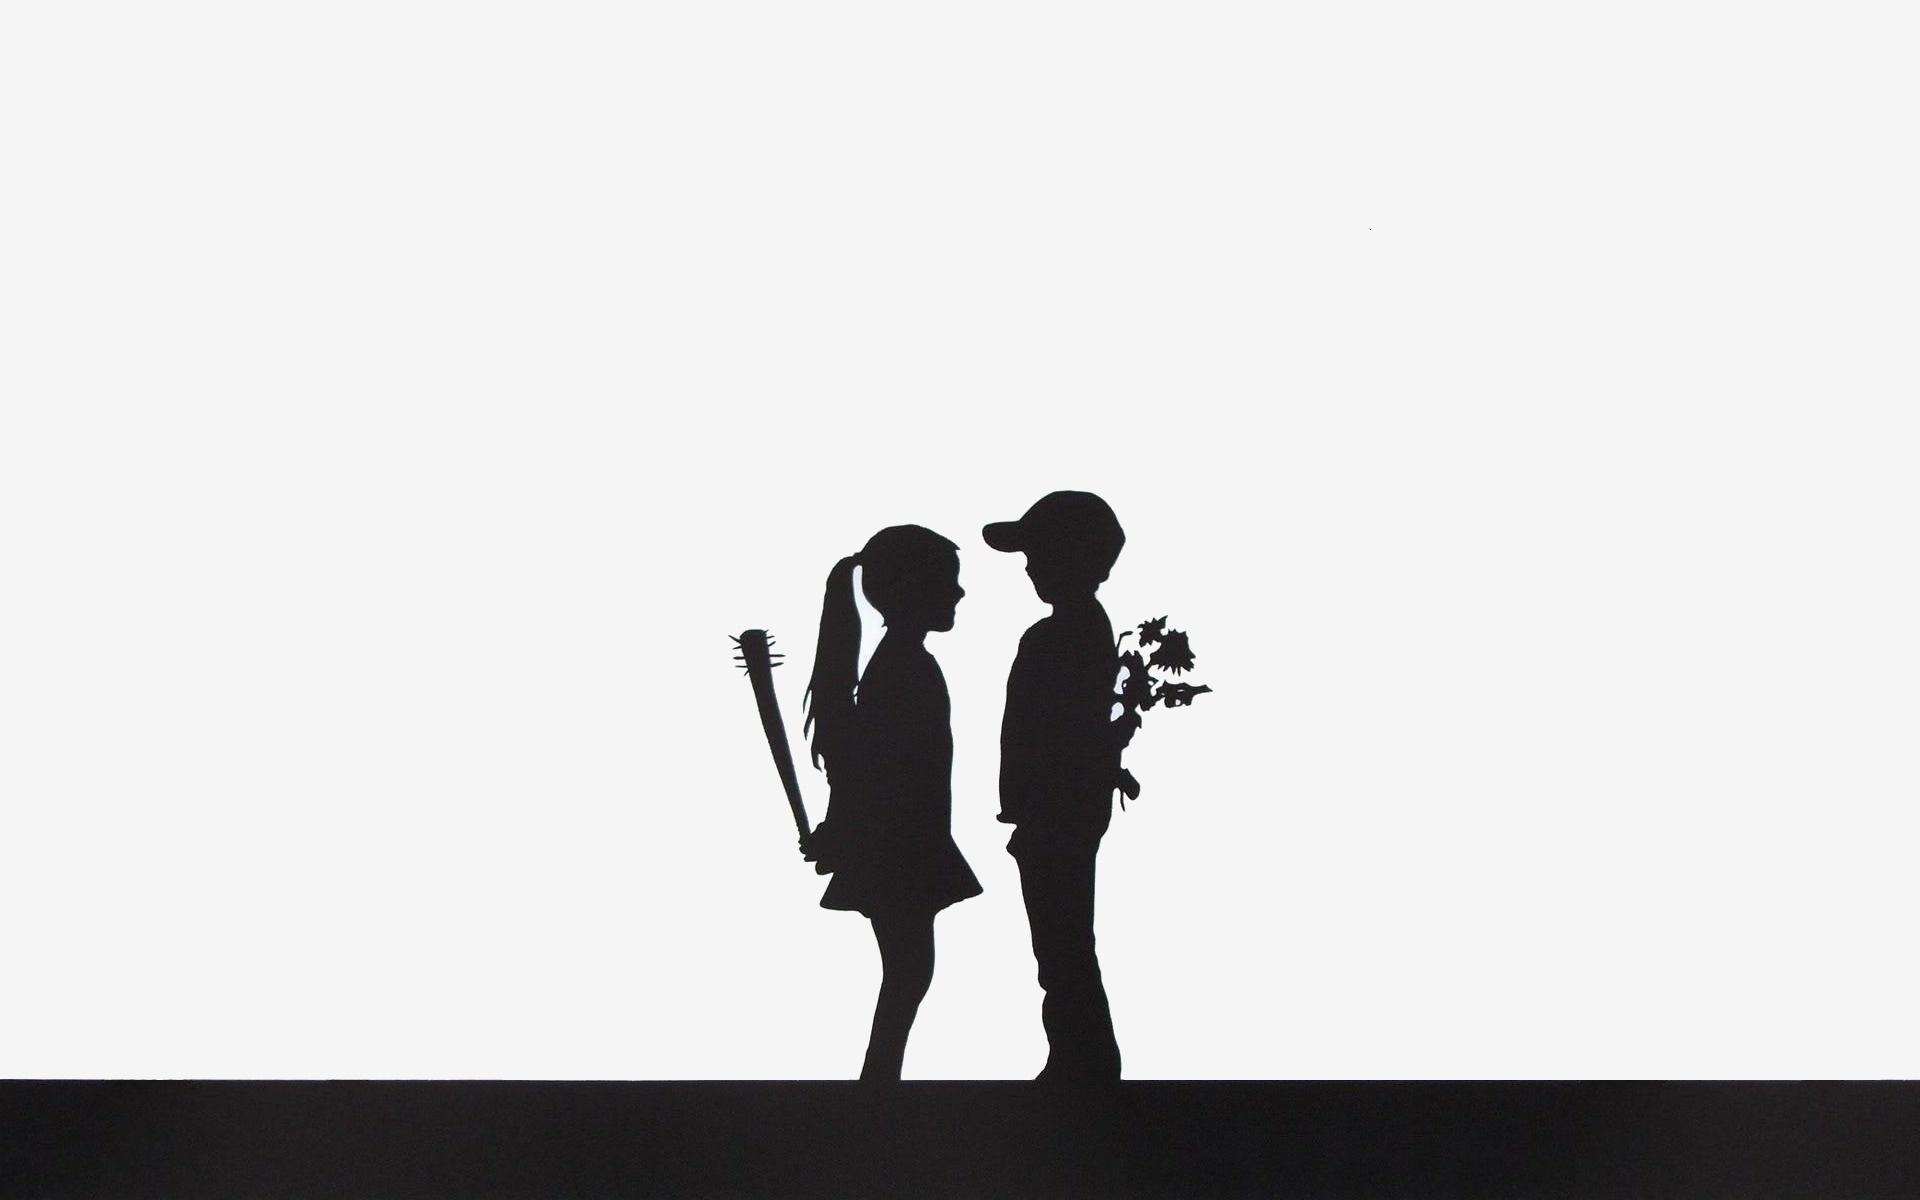 Wallpaper Illustration Flowers Silhouette Brand Boy